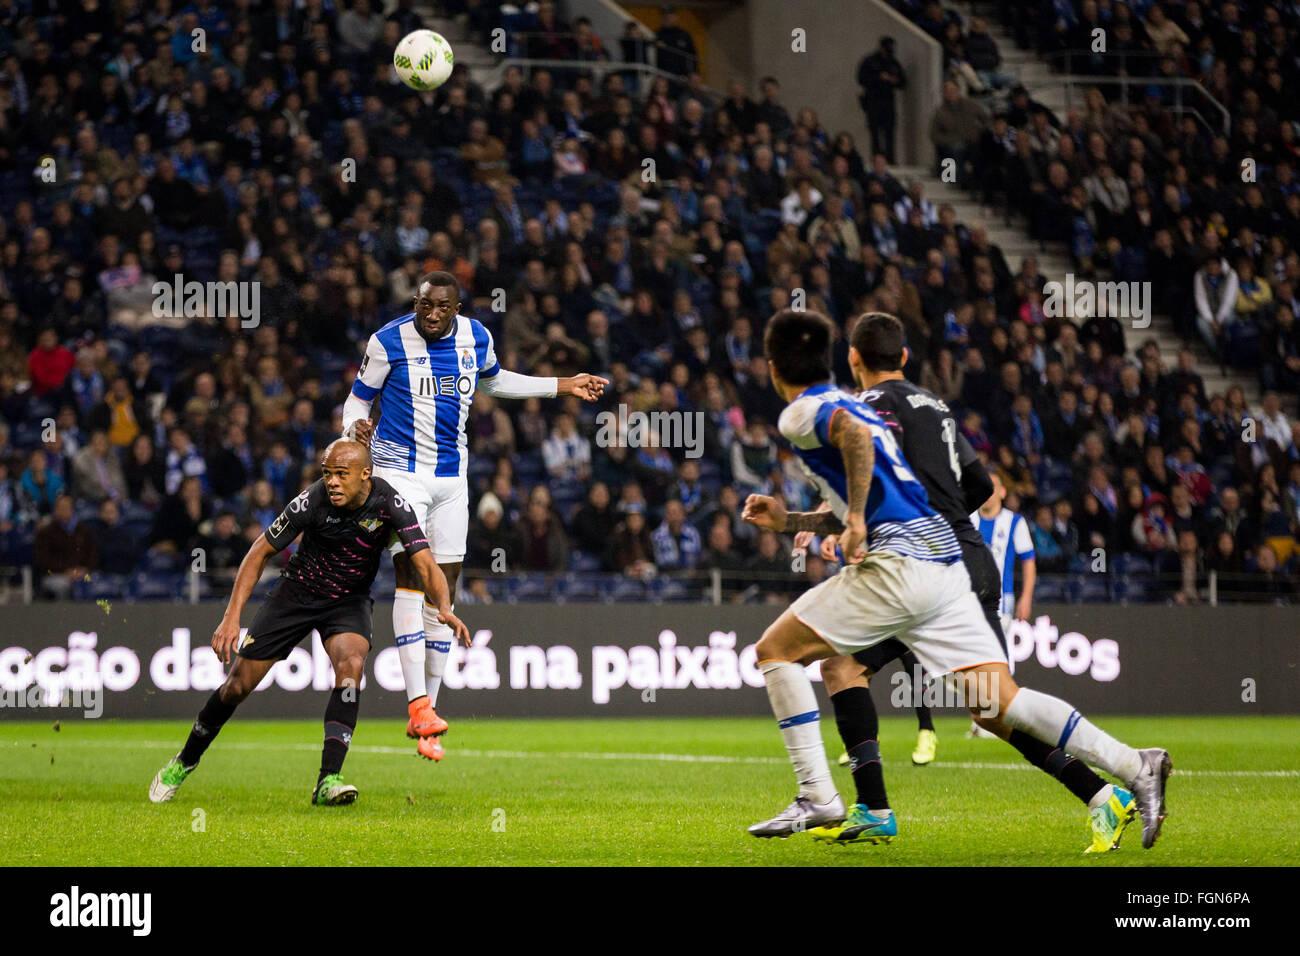 Dragon Stadium, Portugal. 21st February, 2016. FC Porto's player Danilo during the Premier League 2015/16 match - Stock Image